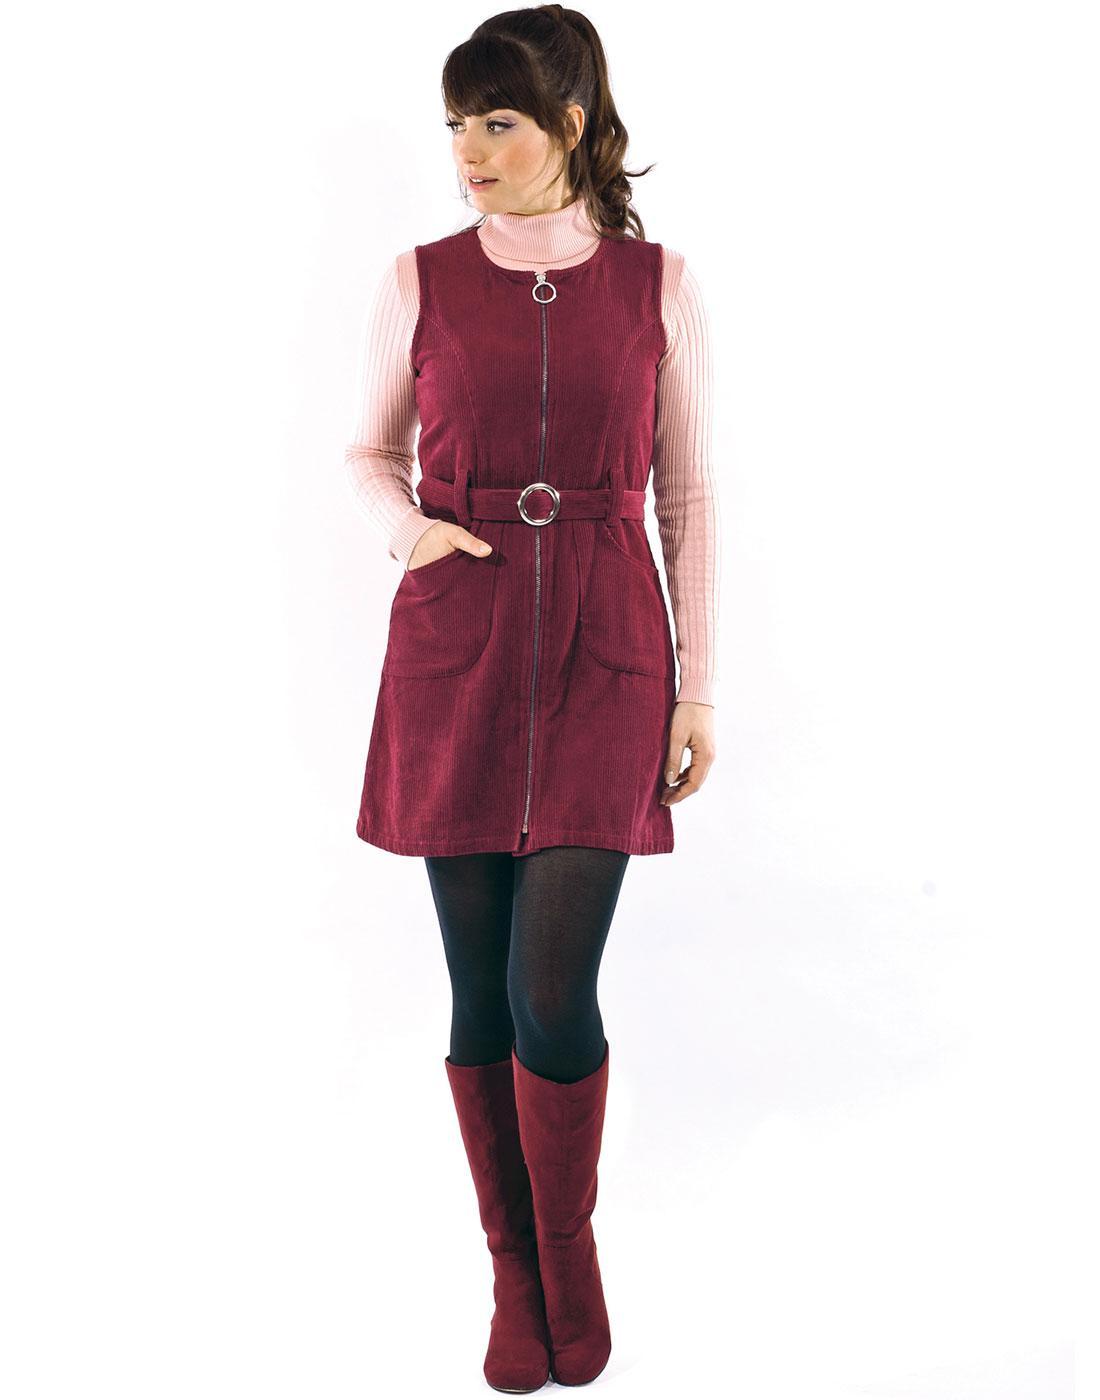 Pixie MADEMOISELLE YEYE Retro 70s Pinafore Dress